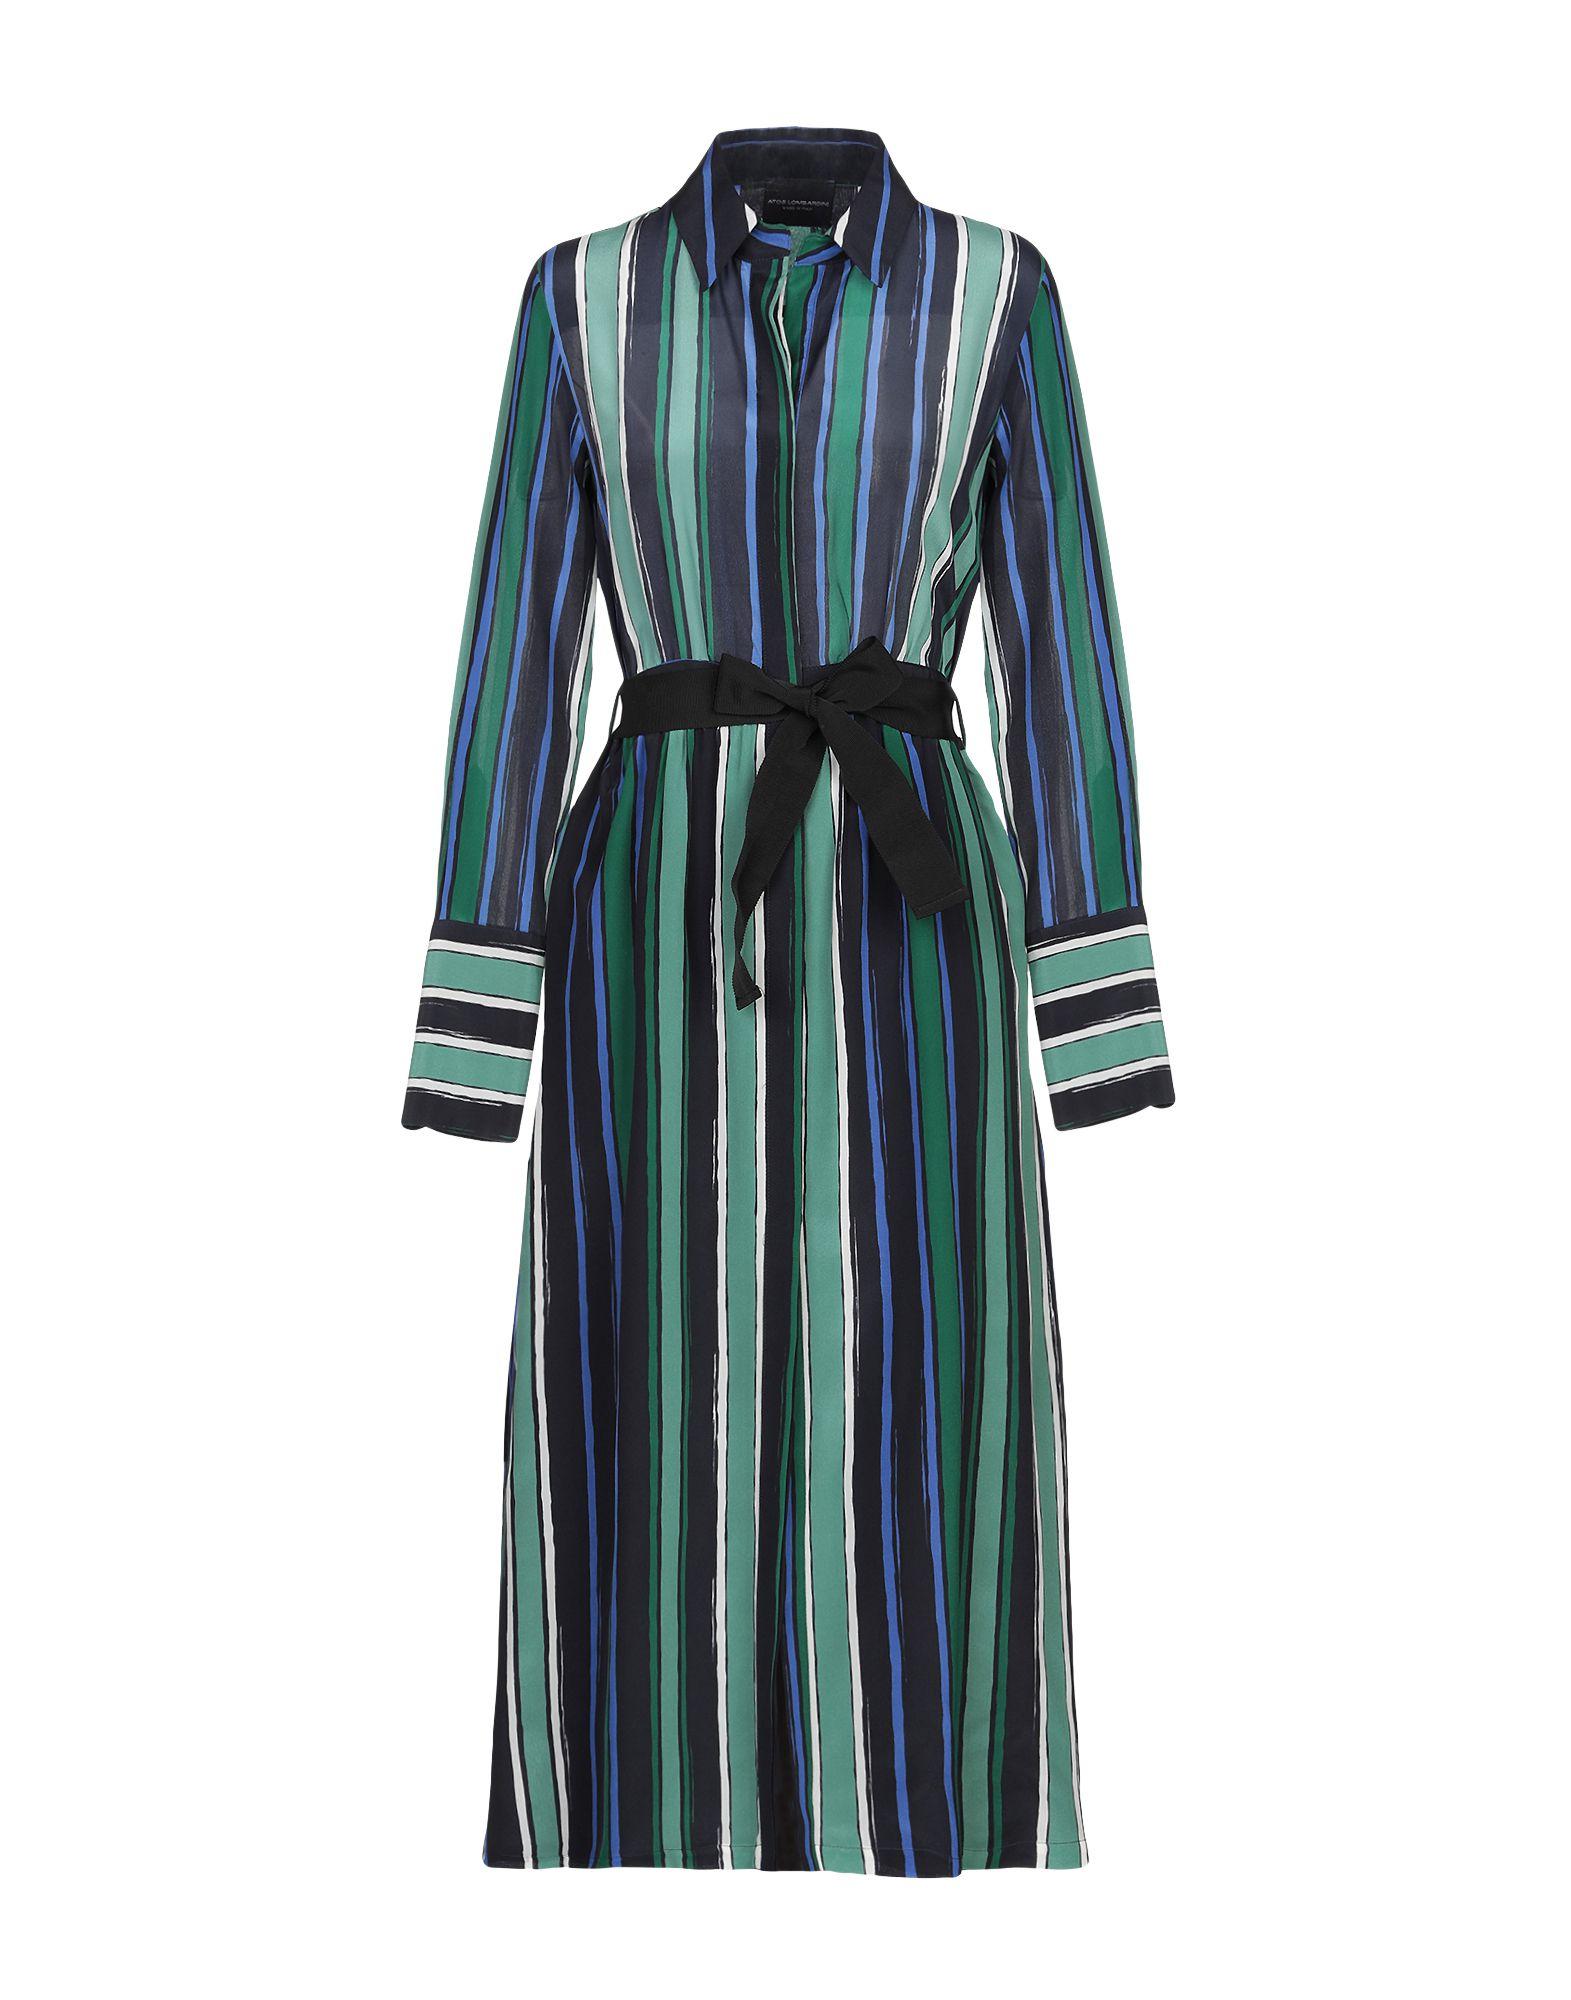 ATOS LOMBARDINI Платье длиной 3/4 violet atos lombardini юбка длиной 3 4